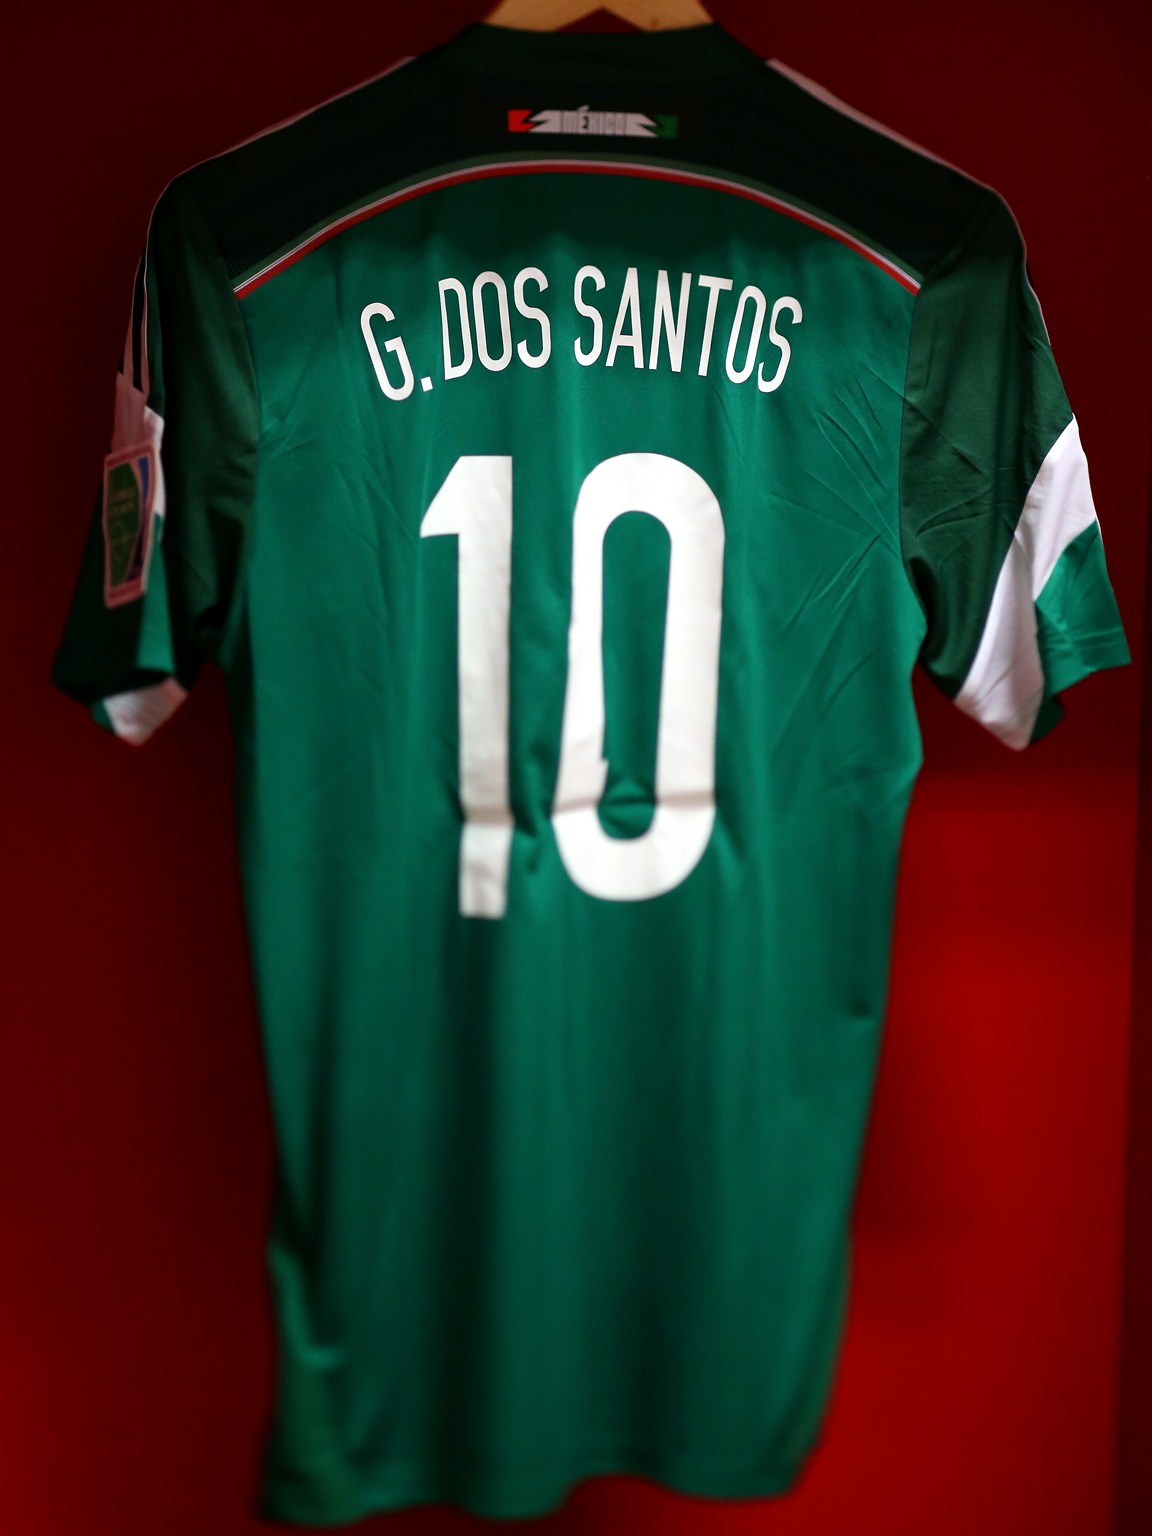 84 - Croatia-Mexico [1-3] -- 23 Jun 2014 - 17-00 - kuaza